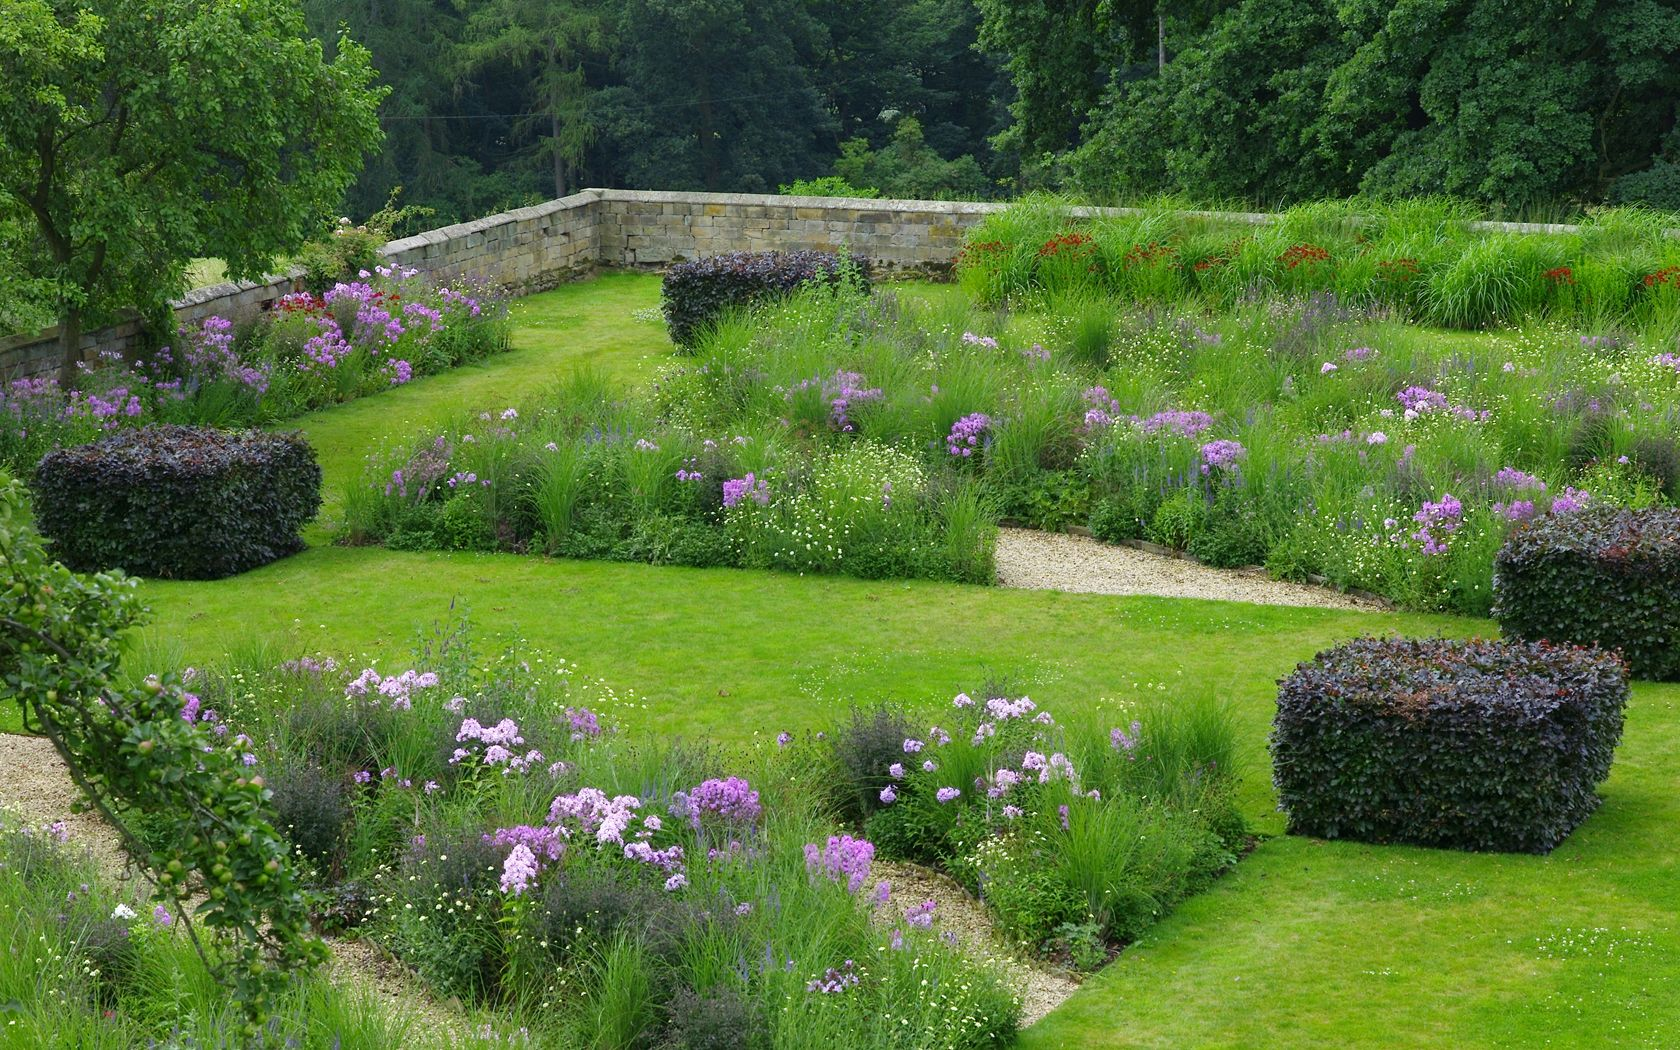 meadow design with lawn in between ~ add beach garden ,namaqualand garden,clivia garden and fern garden ~ within a hedge boundary ~ Gallery - Arne Maynard Garden Design